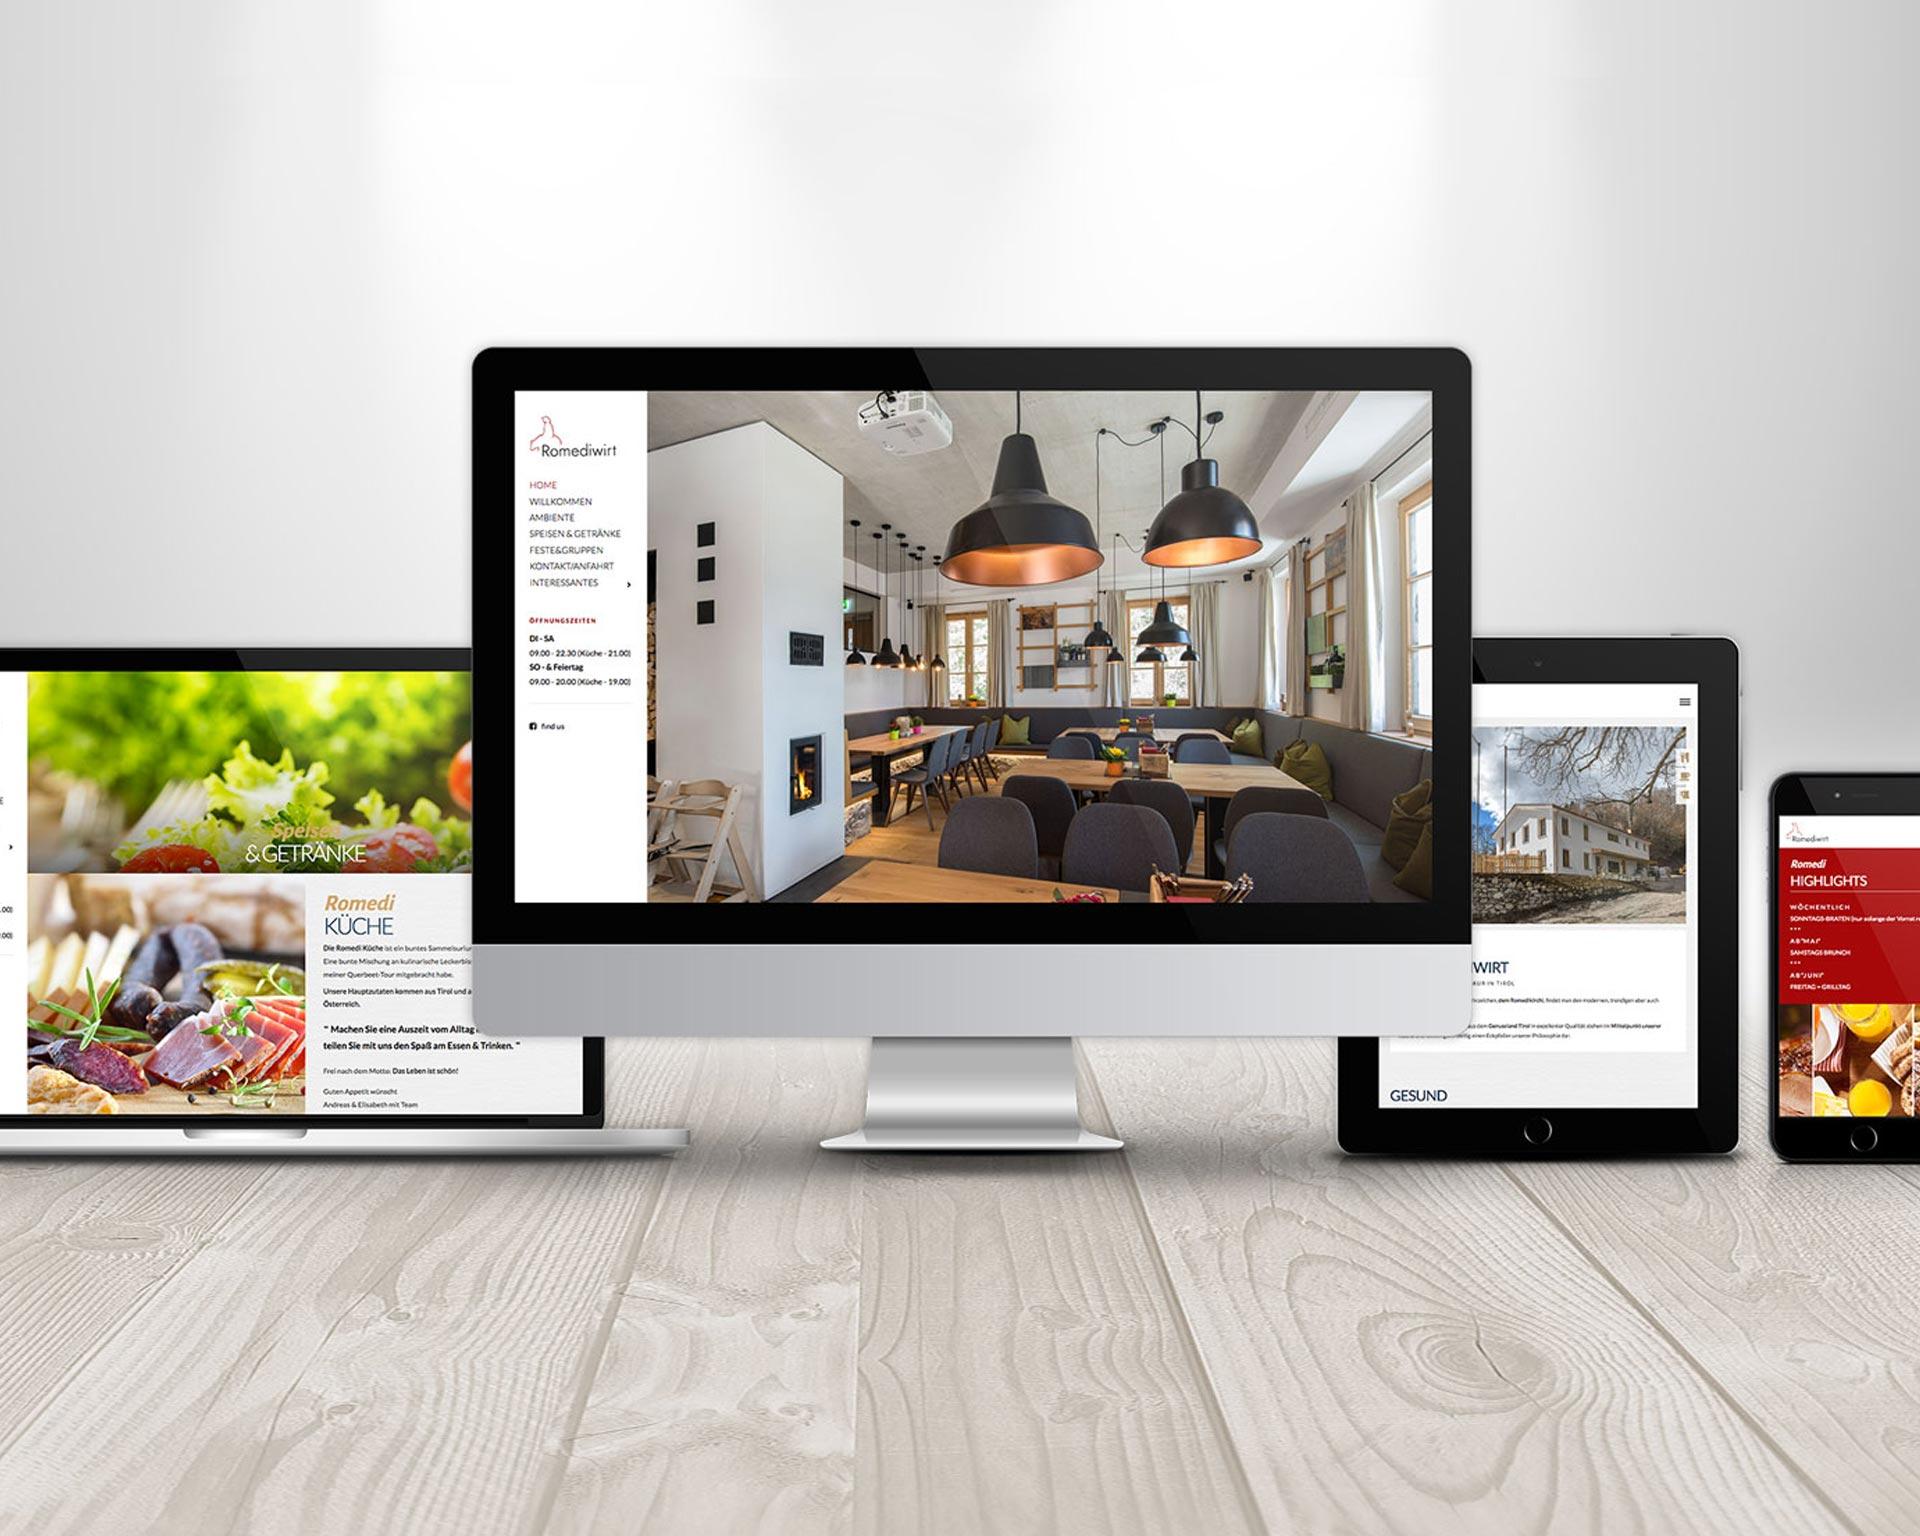 Werbeagentur - agentur 13 Tirol, Romediwirt Webdesign